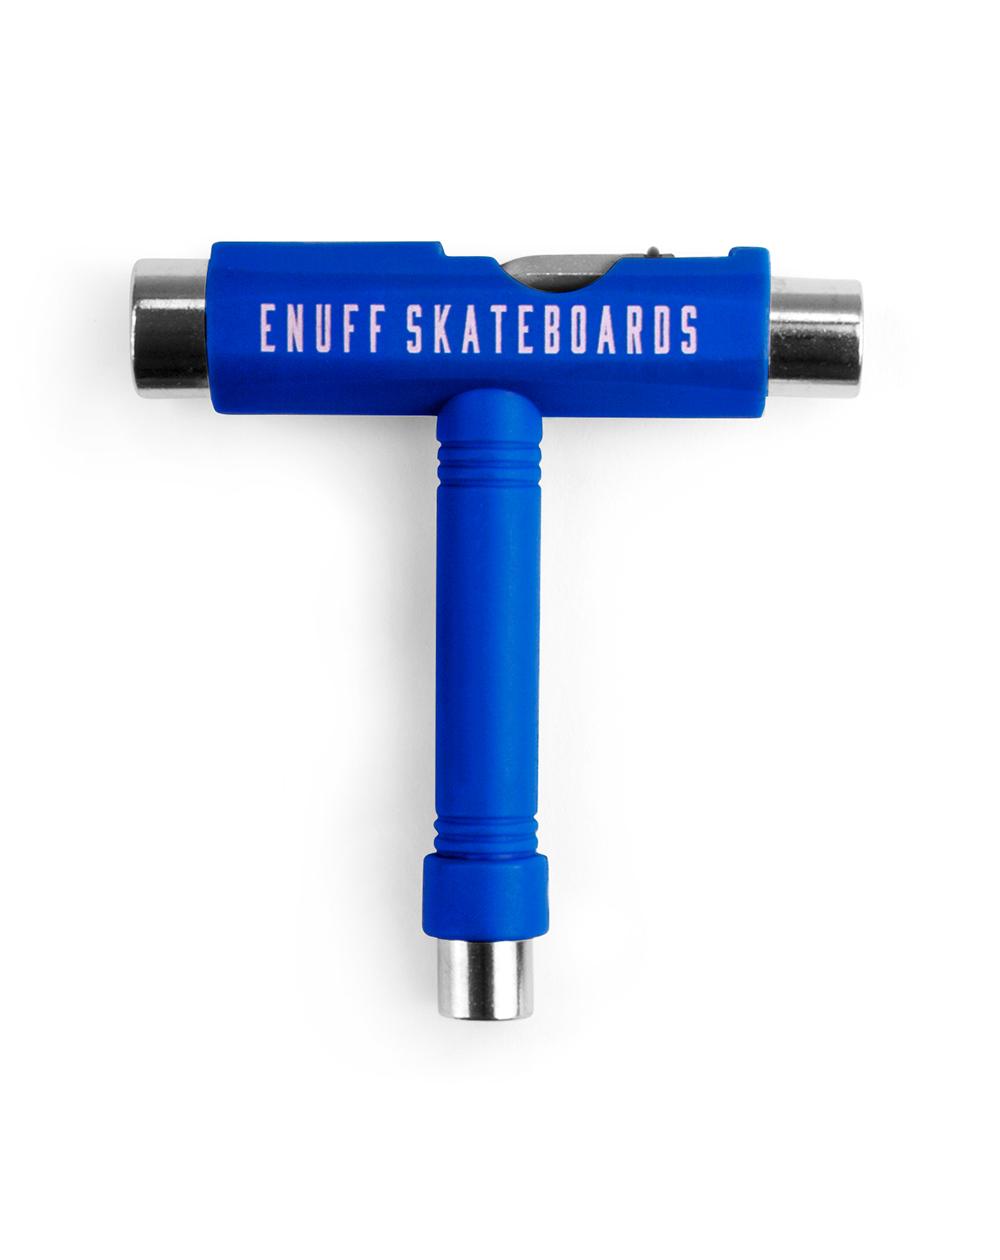 Enuff Chiave Multiuso Skateboard Essential Tool Blue